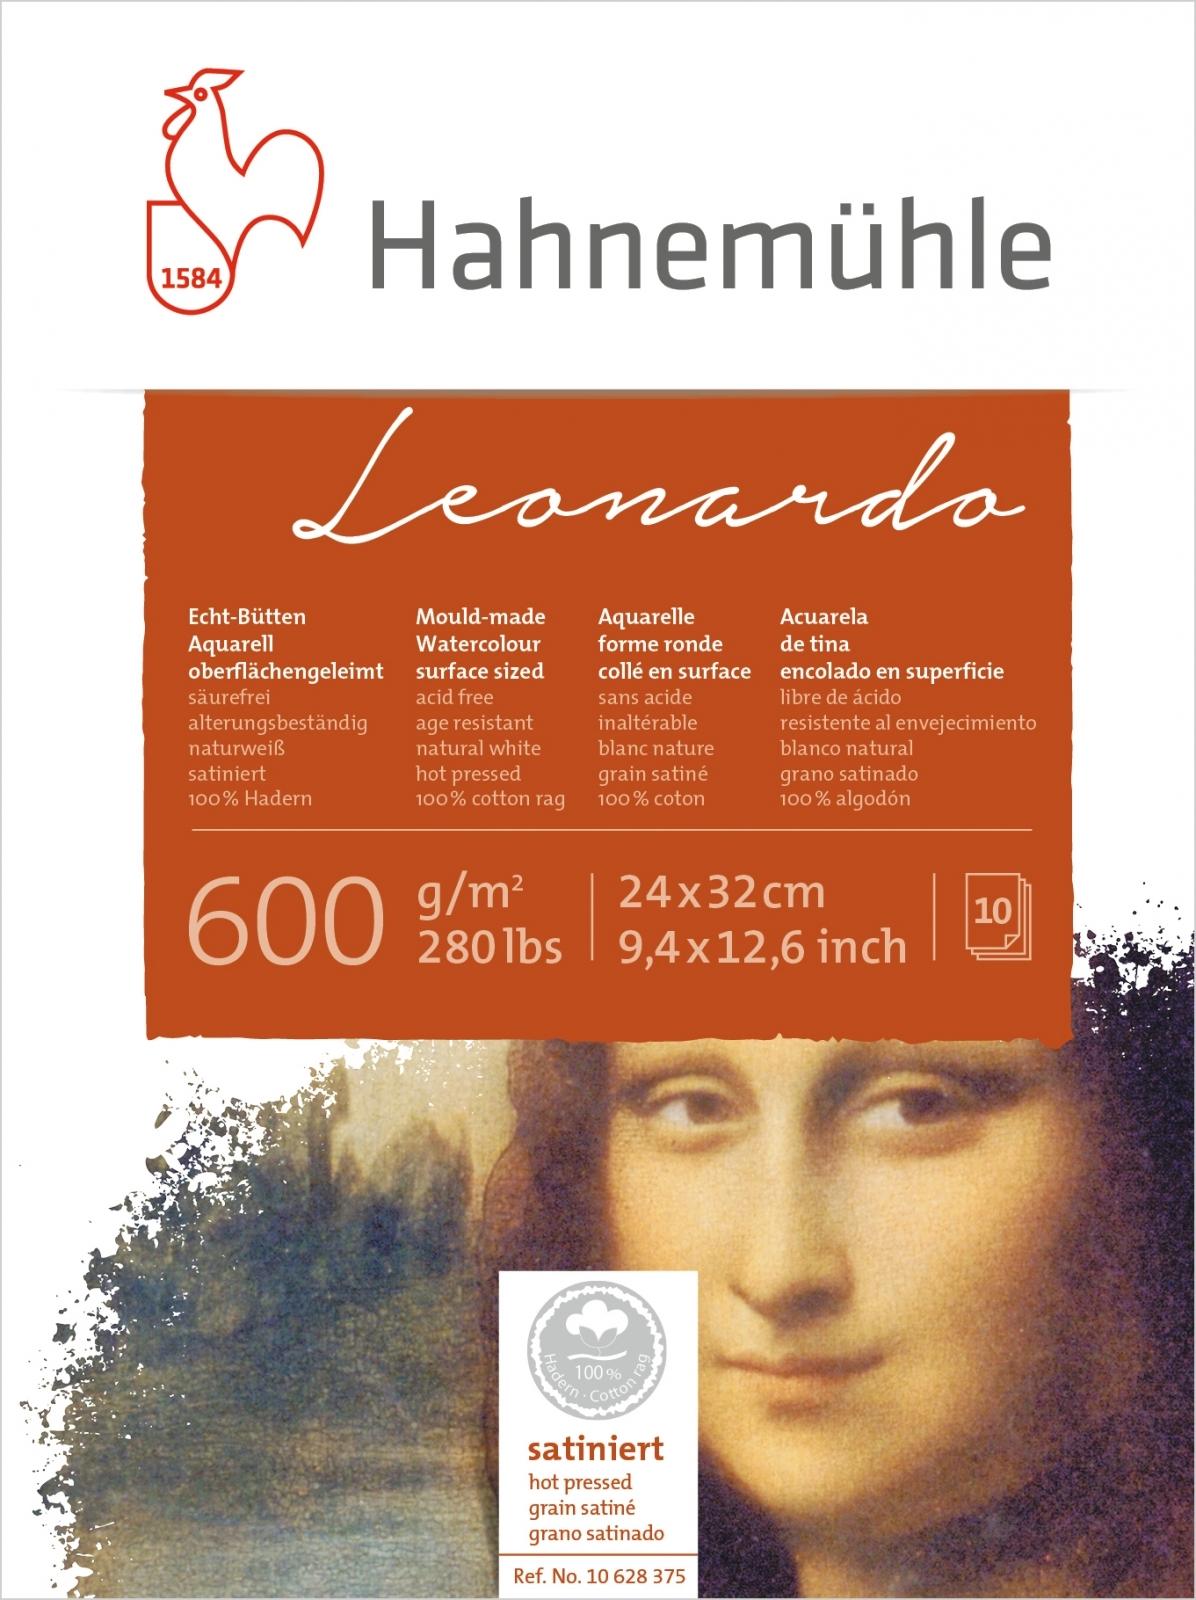 Papel Hahnemuhle Leonardo Textura Satinada 600g/m2 24x32 10f - Papelaria Botafogo